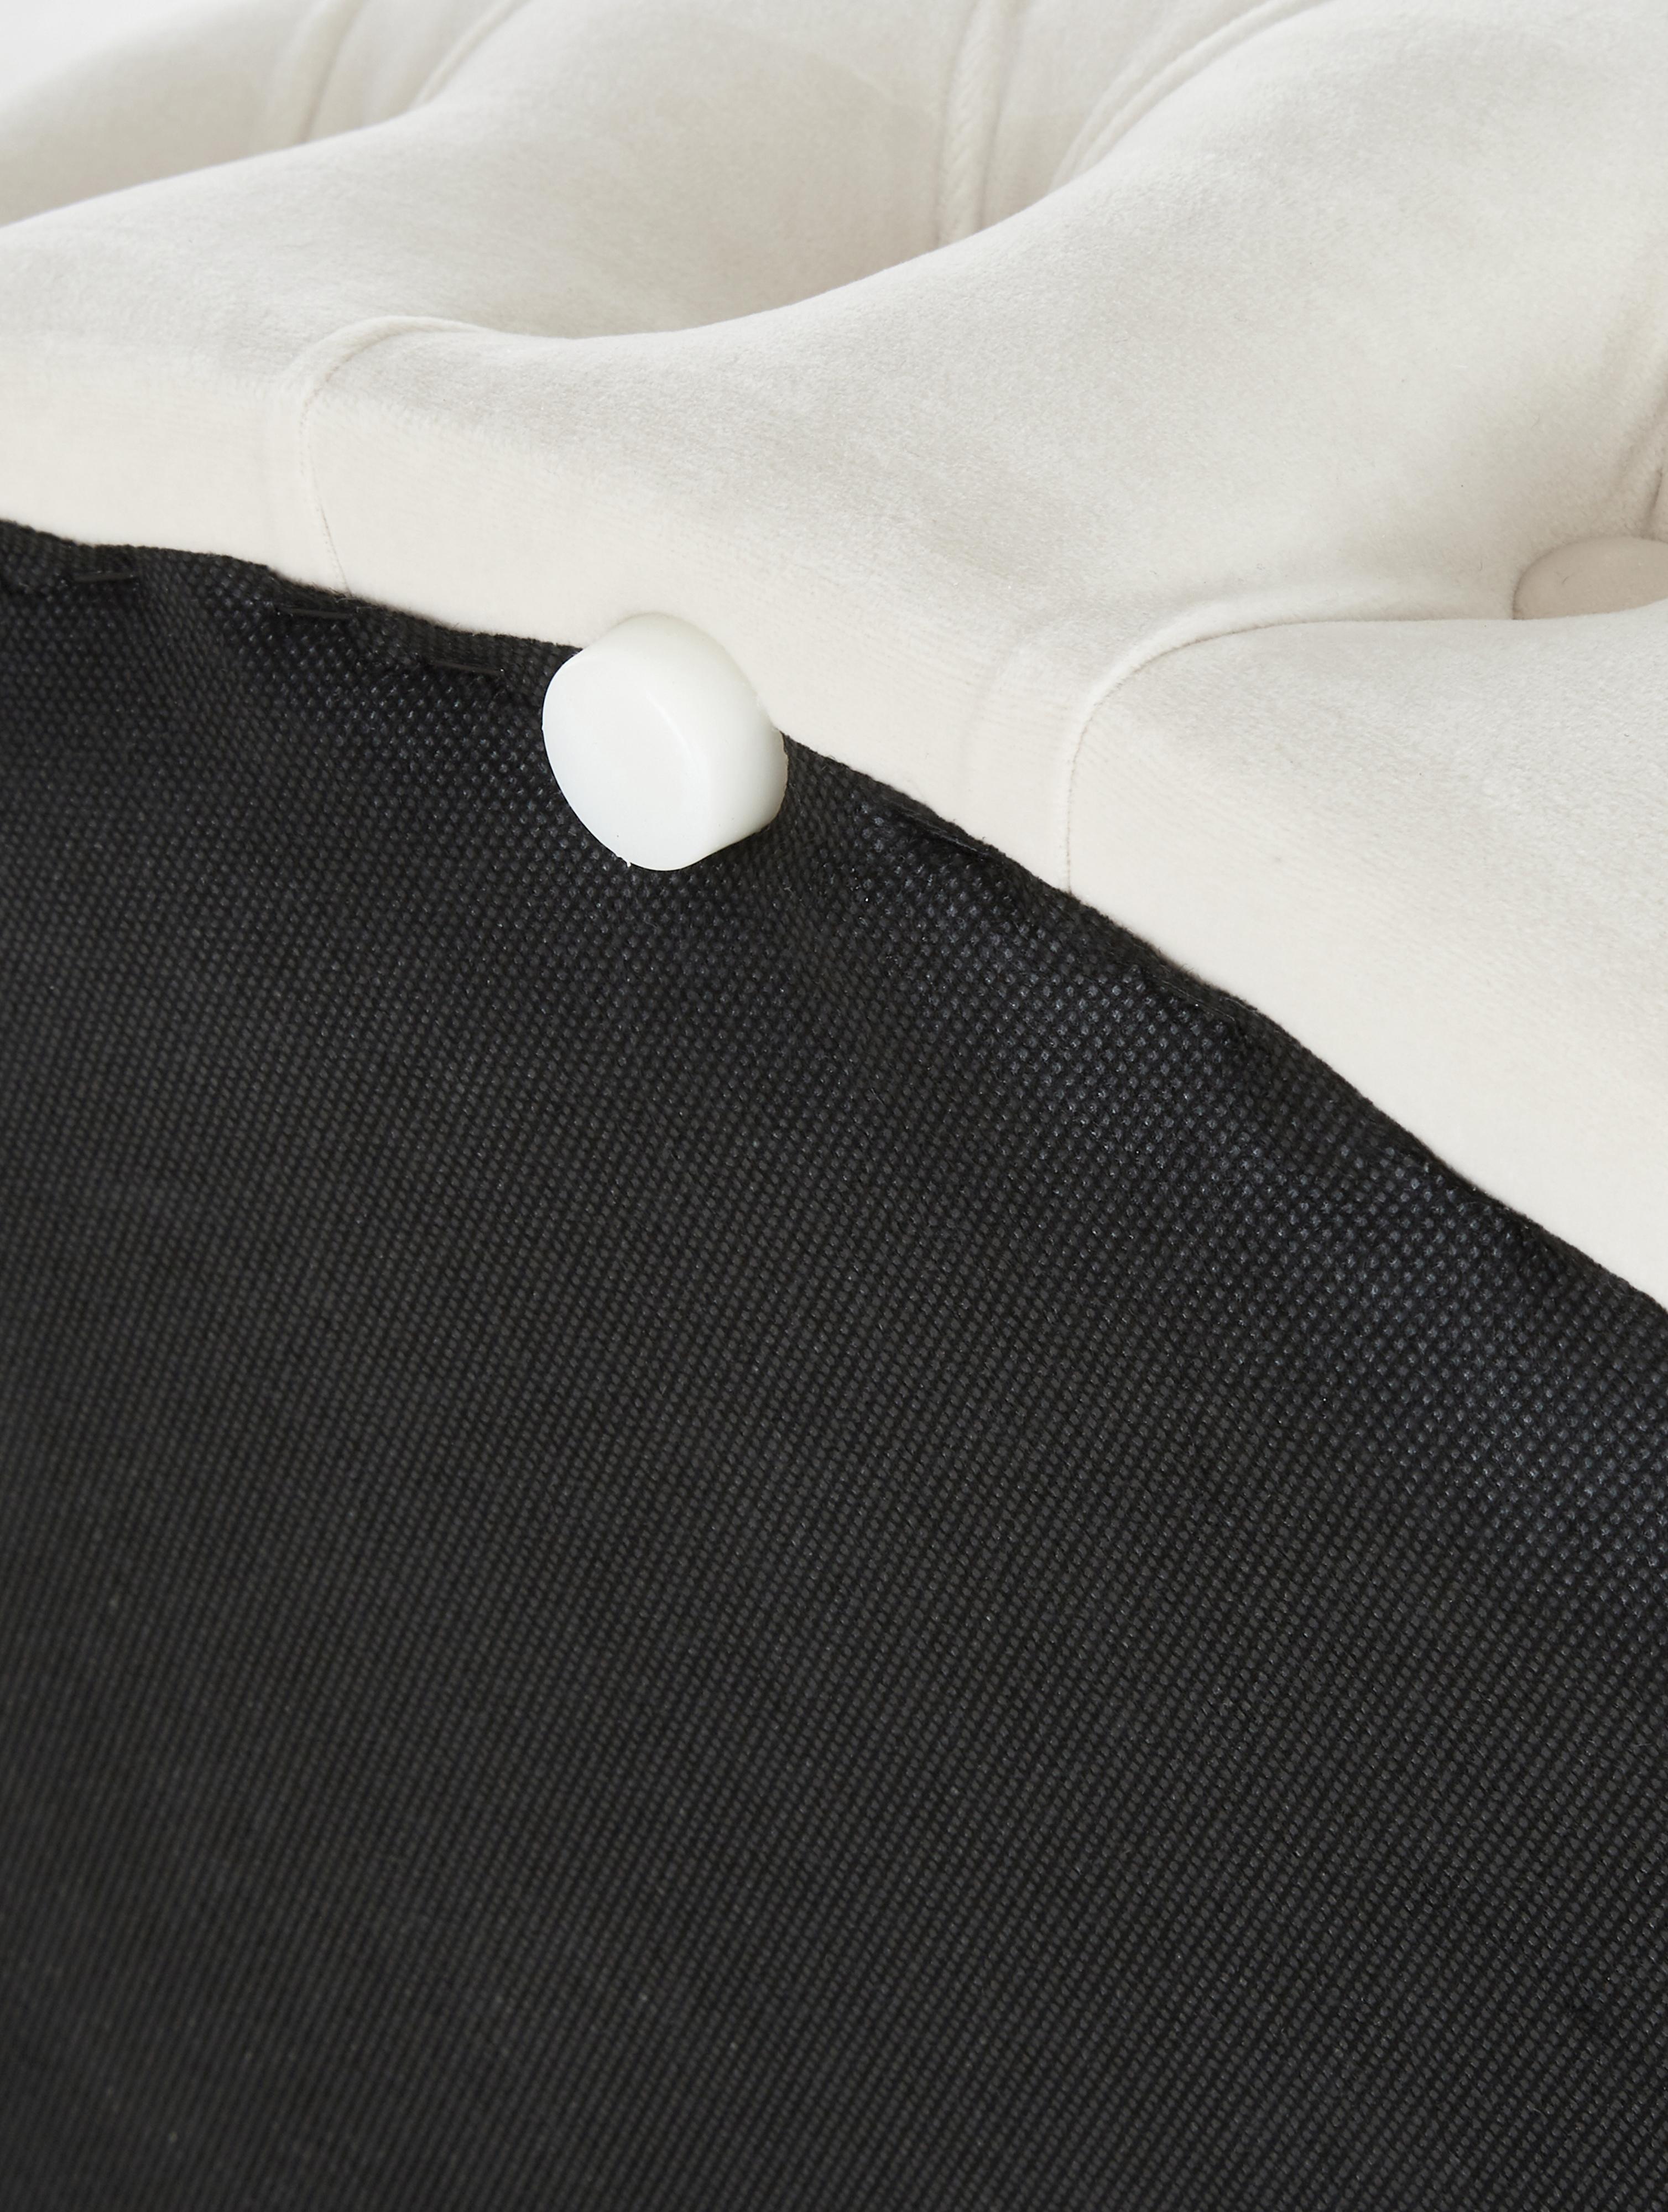 XL Samt-Hocker Chiara mit Stauraum, Bezug: Samt (Polyester) 20.000 S, Korpus: Eukalyptusholz, Cremeweiß, Ø 70 x H 42 cm